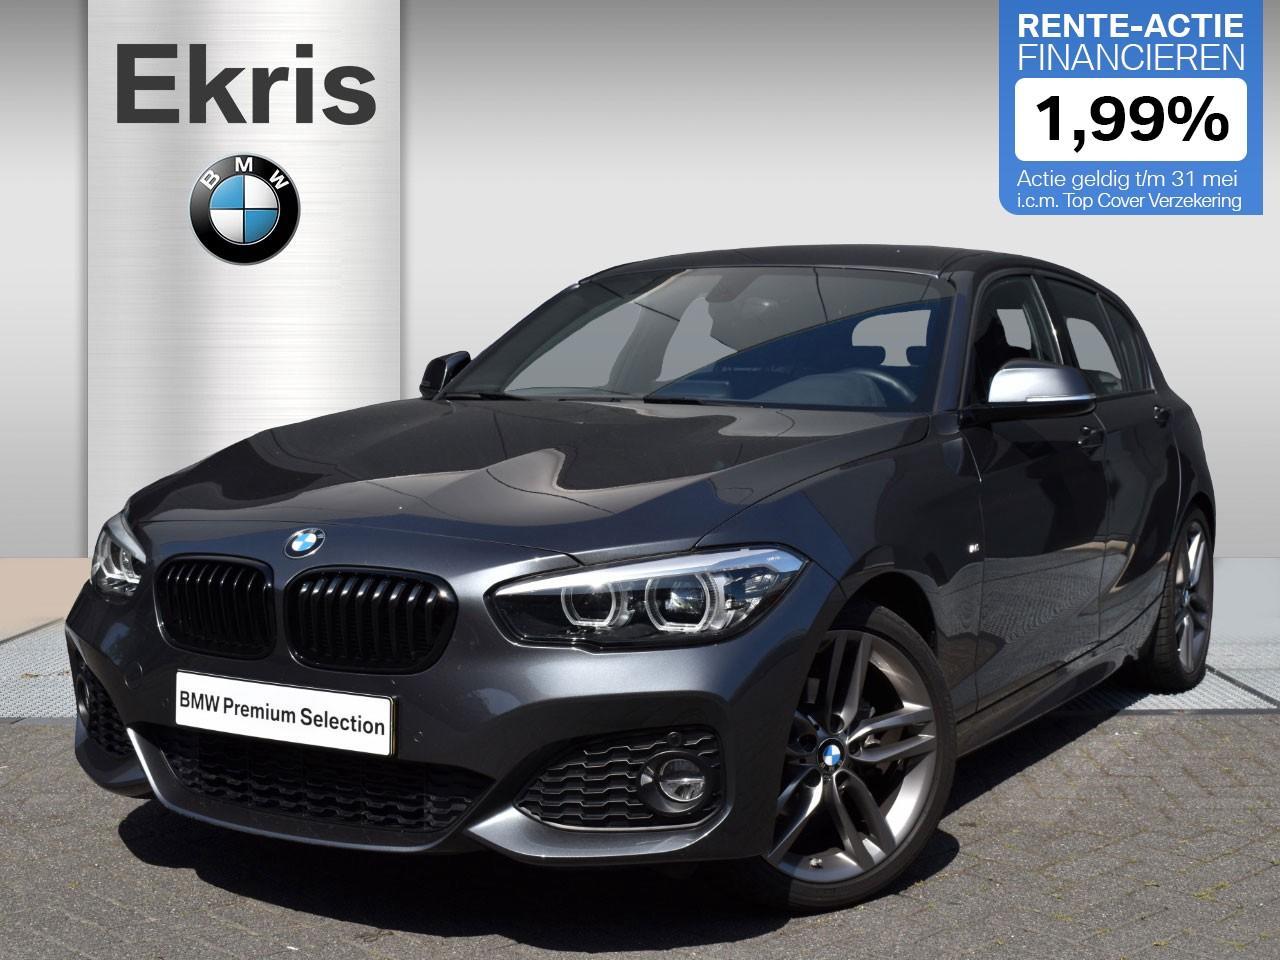 Bmw 1 serie 118i 5-deurs aut. high executive m sportpakket / lederen sportstoelen - showmodel deal